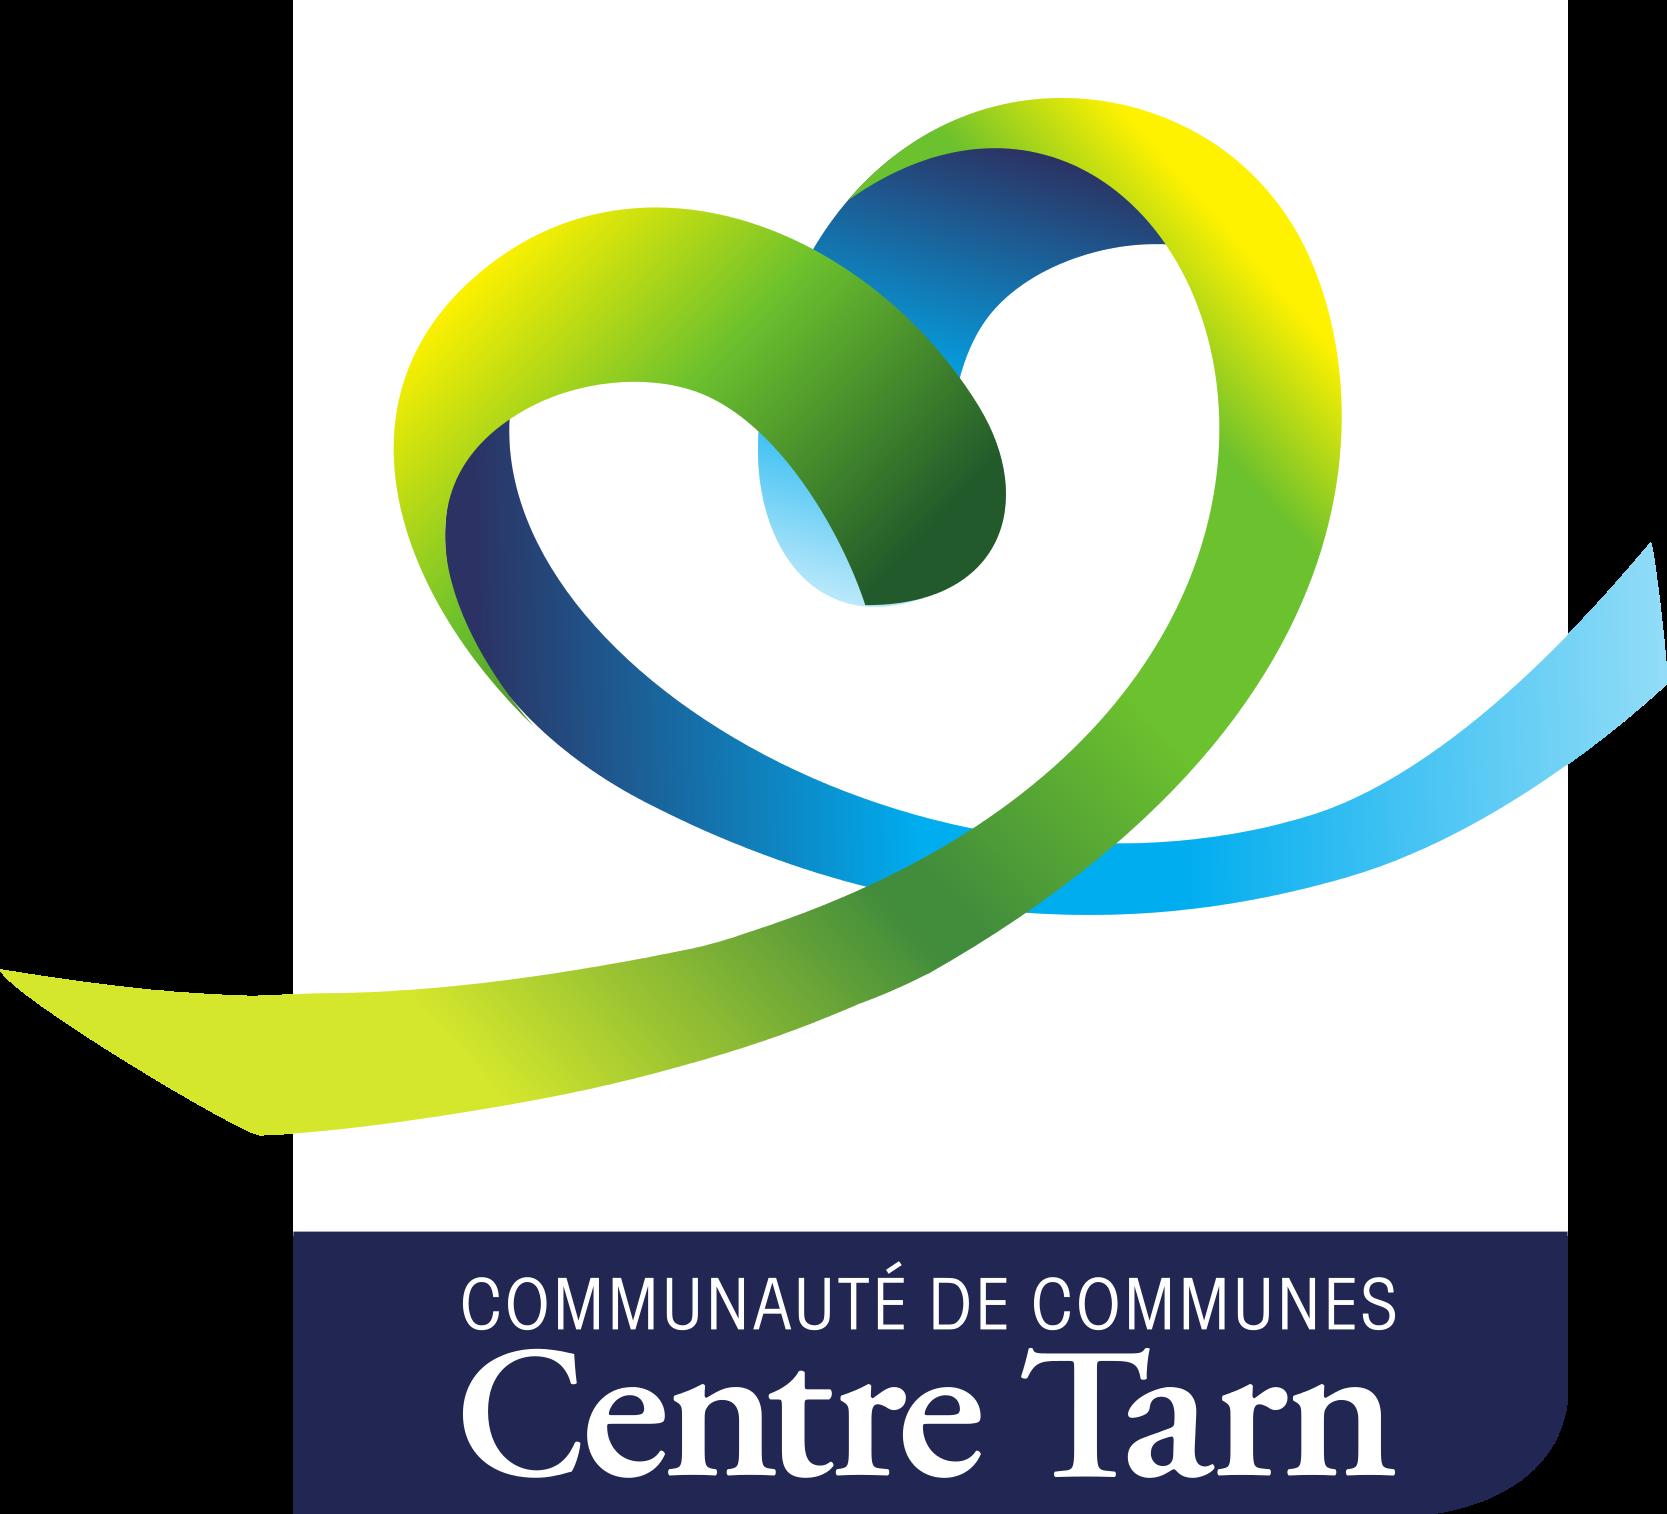 La Communauté de Communes Centre Tarn recrute